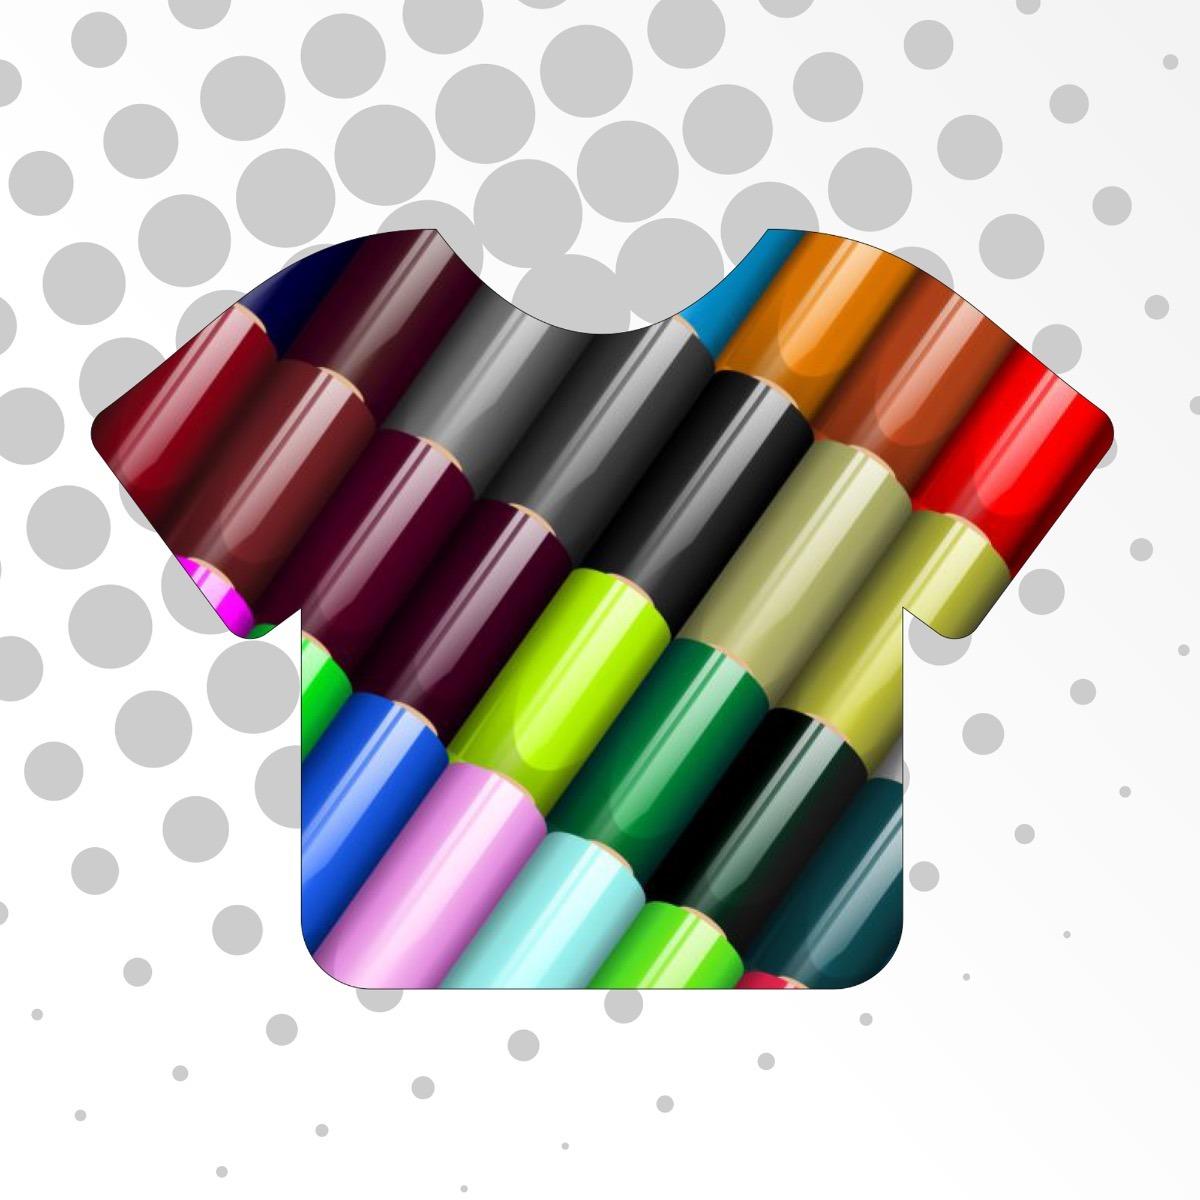 Vinil Textil Siser Easyweed En Hoja De 37 X 30 Cm Colores -   79.00 ... 44cfd14b8580b